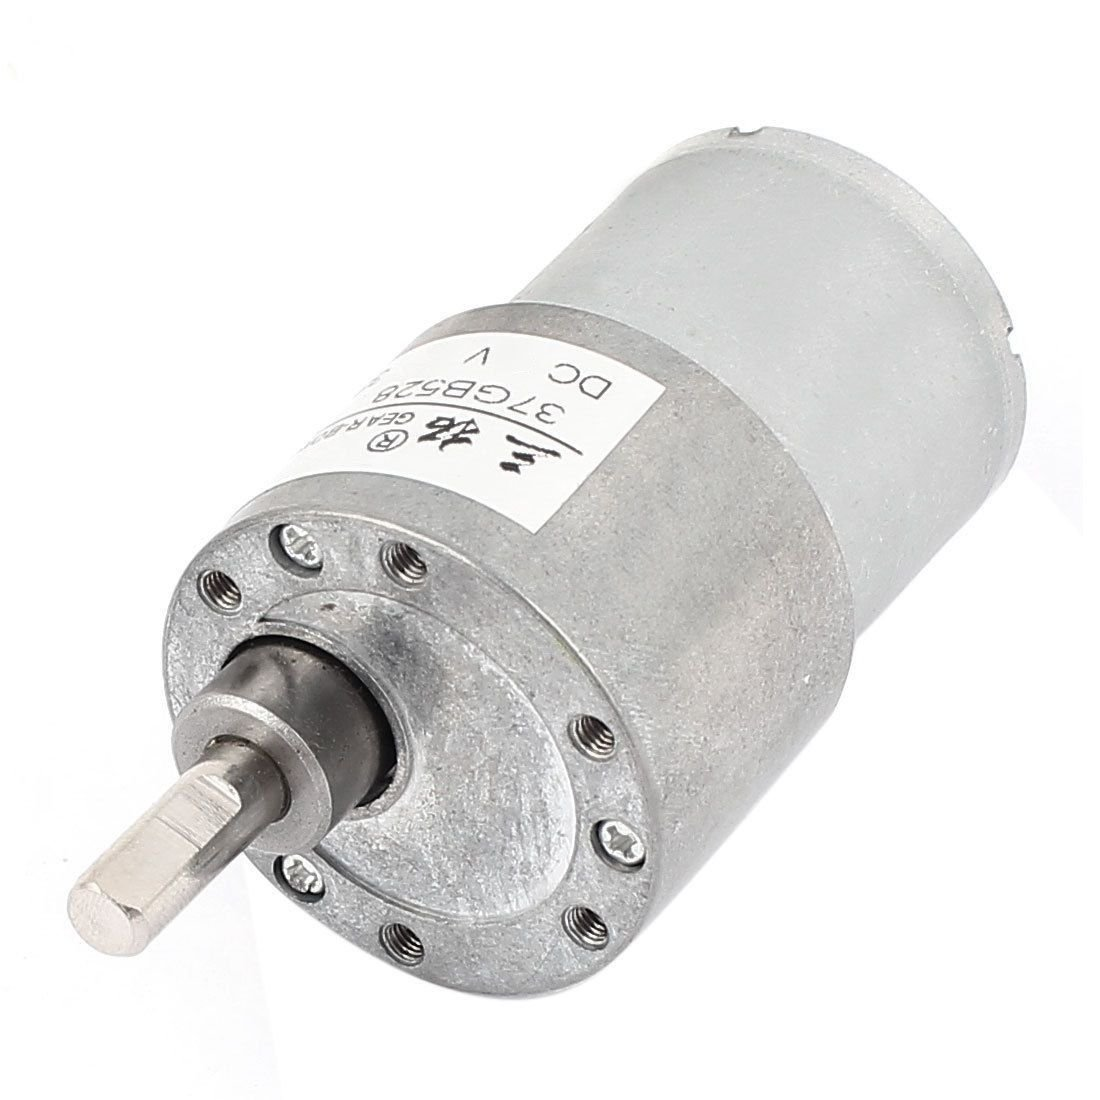 DC 24V 50RPM 0.15A 2.4KG.cm High Torque DC Gear Box Reducer Variable Speed Motor